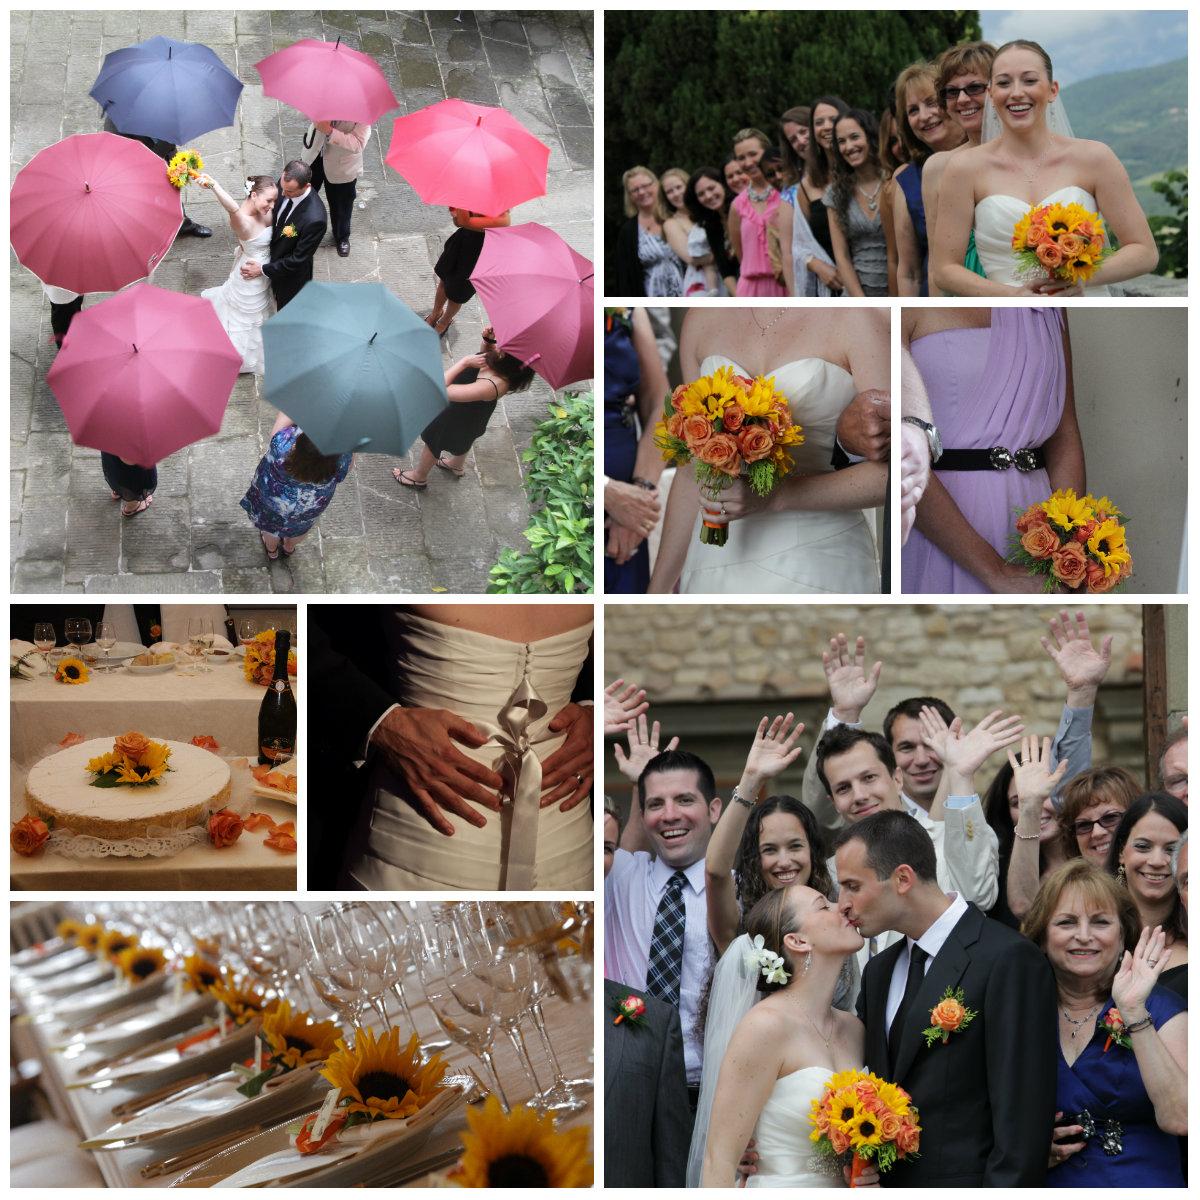 Castle wedding in June in Tuscany